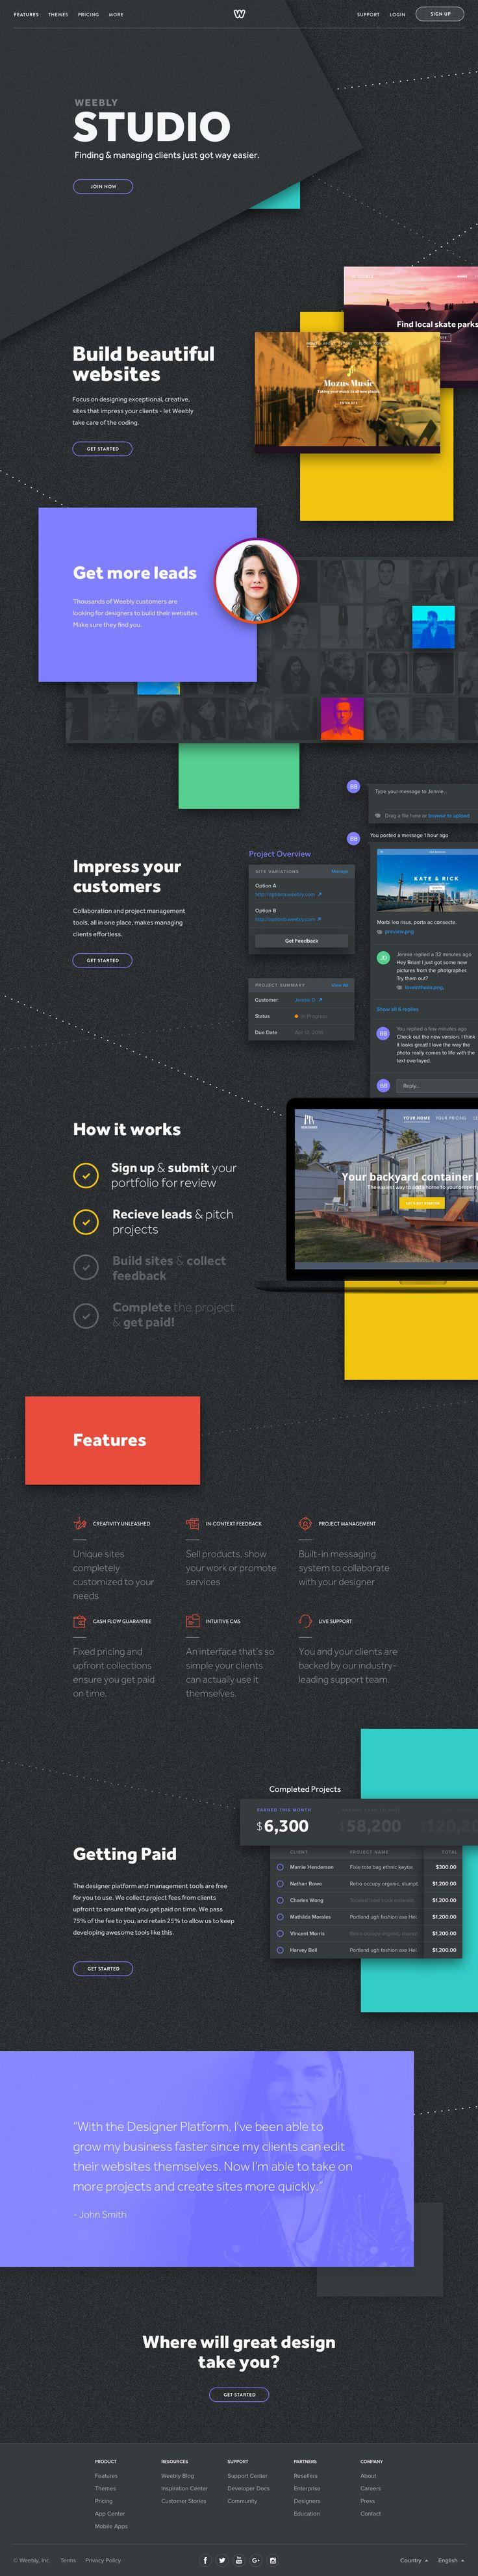 Best 25+ Web design layouts ideas on Pinterest | Web design ...